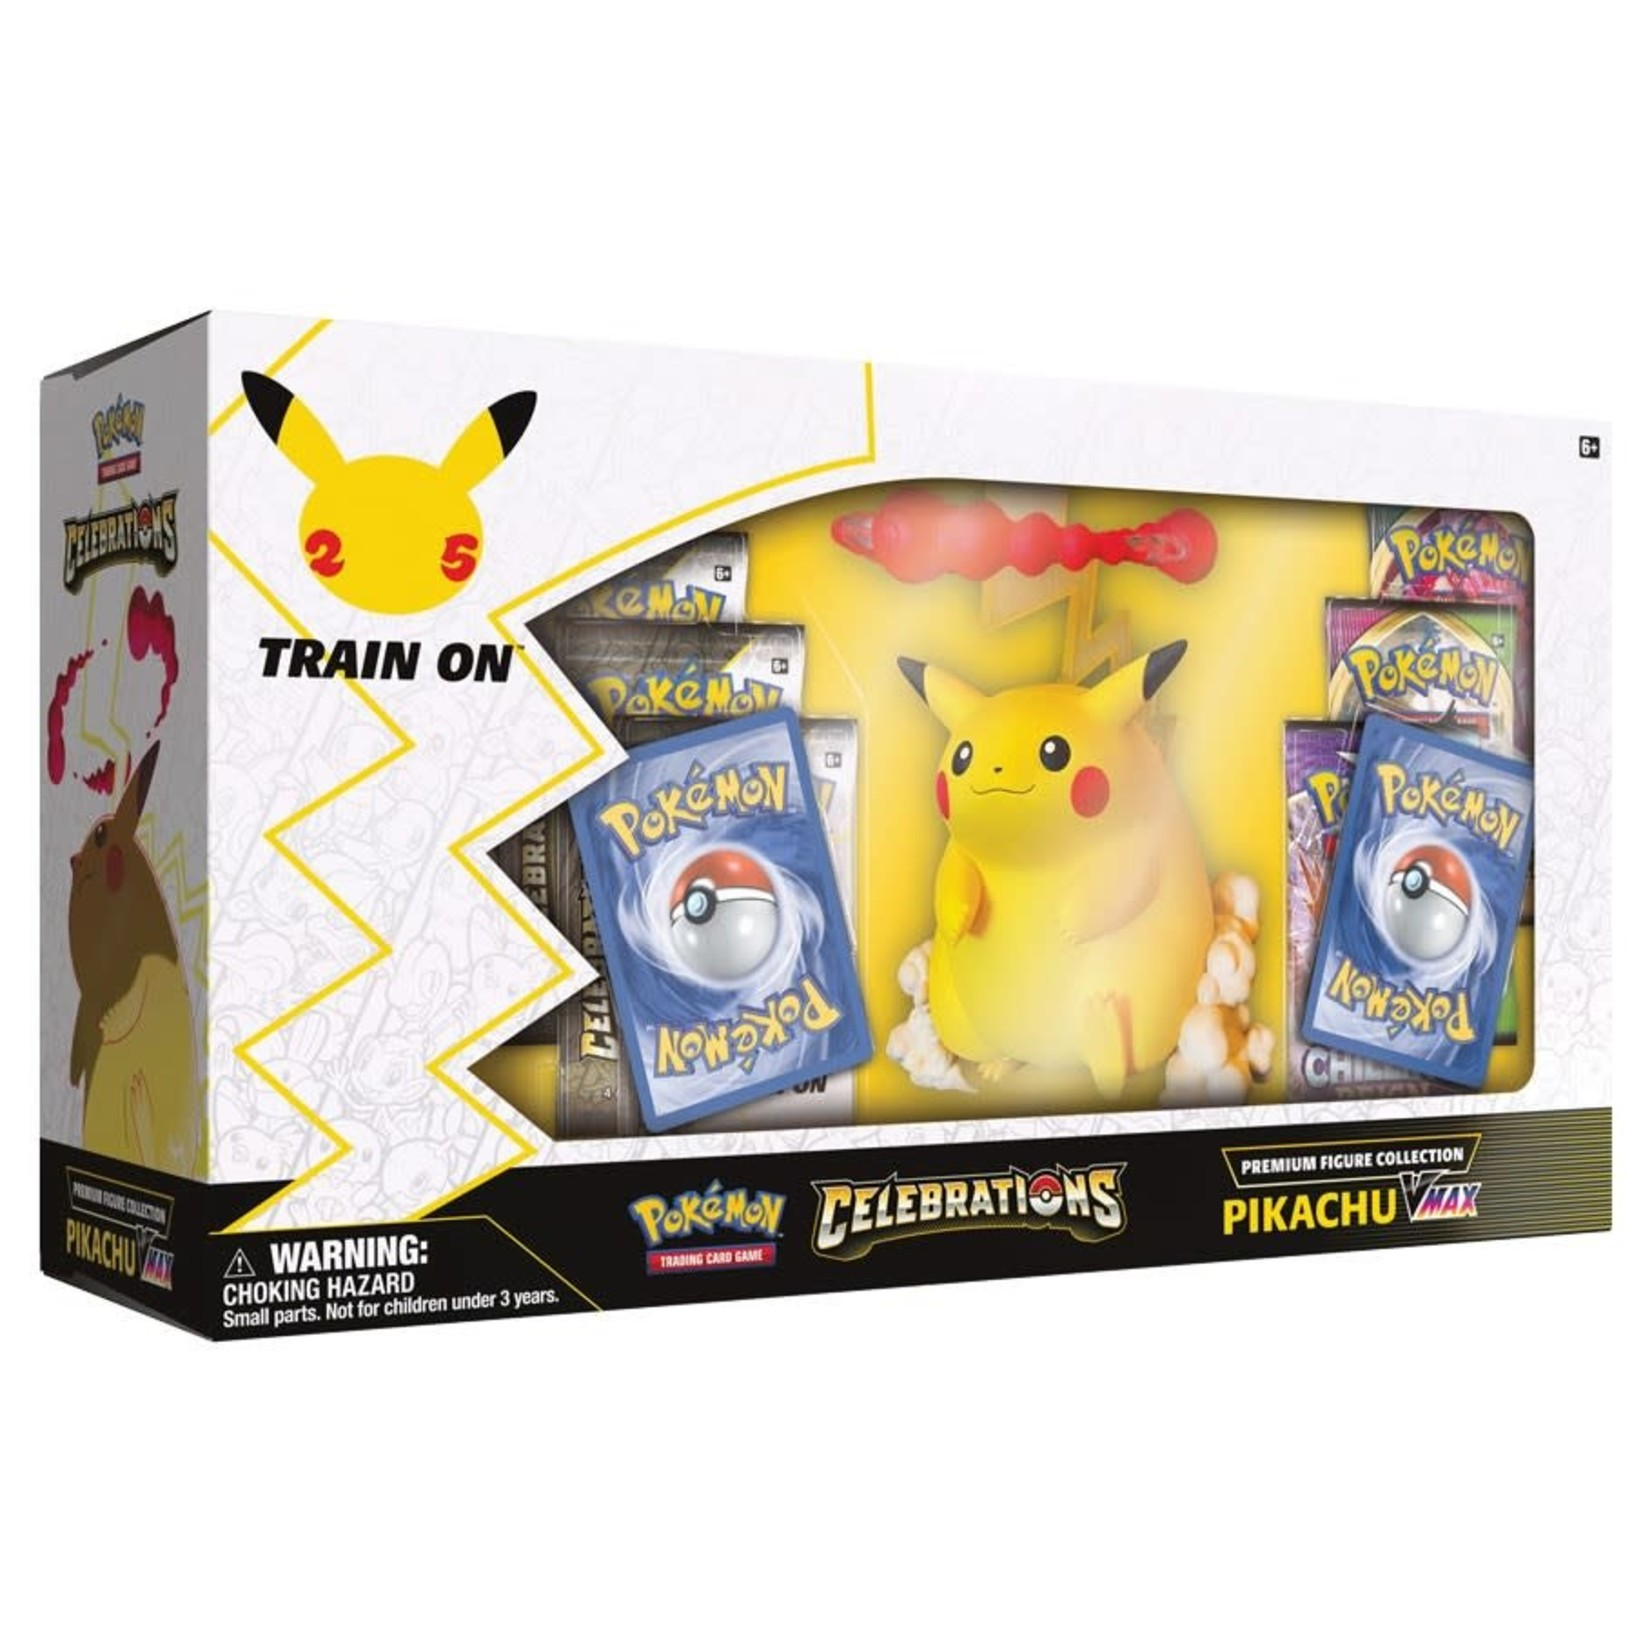 The Pokemon Company [Preorder] Pokémon TCG: Celebrations Premium Figure Collection—Pikachu VMAX